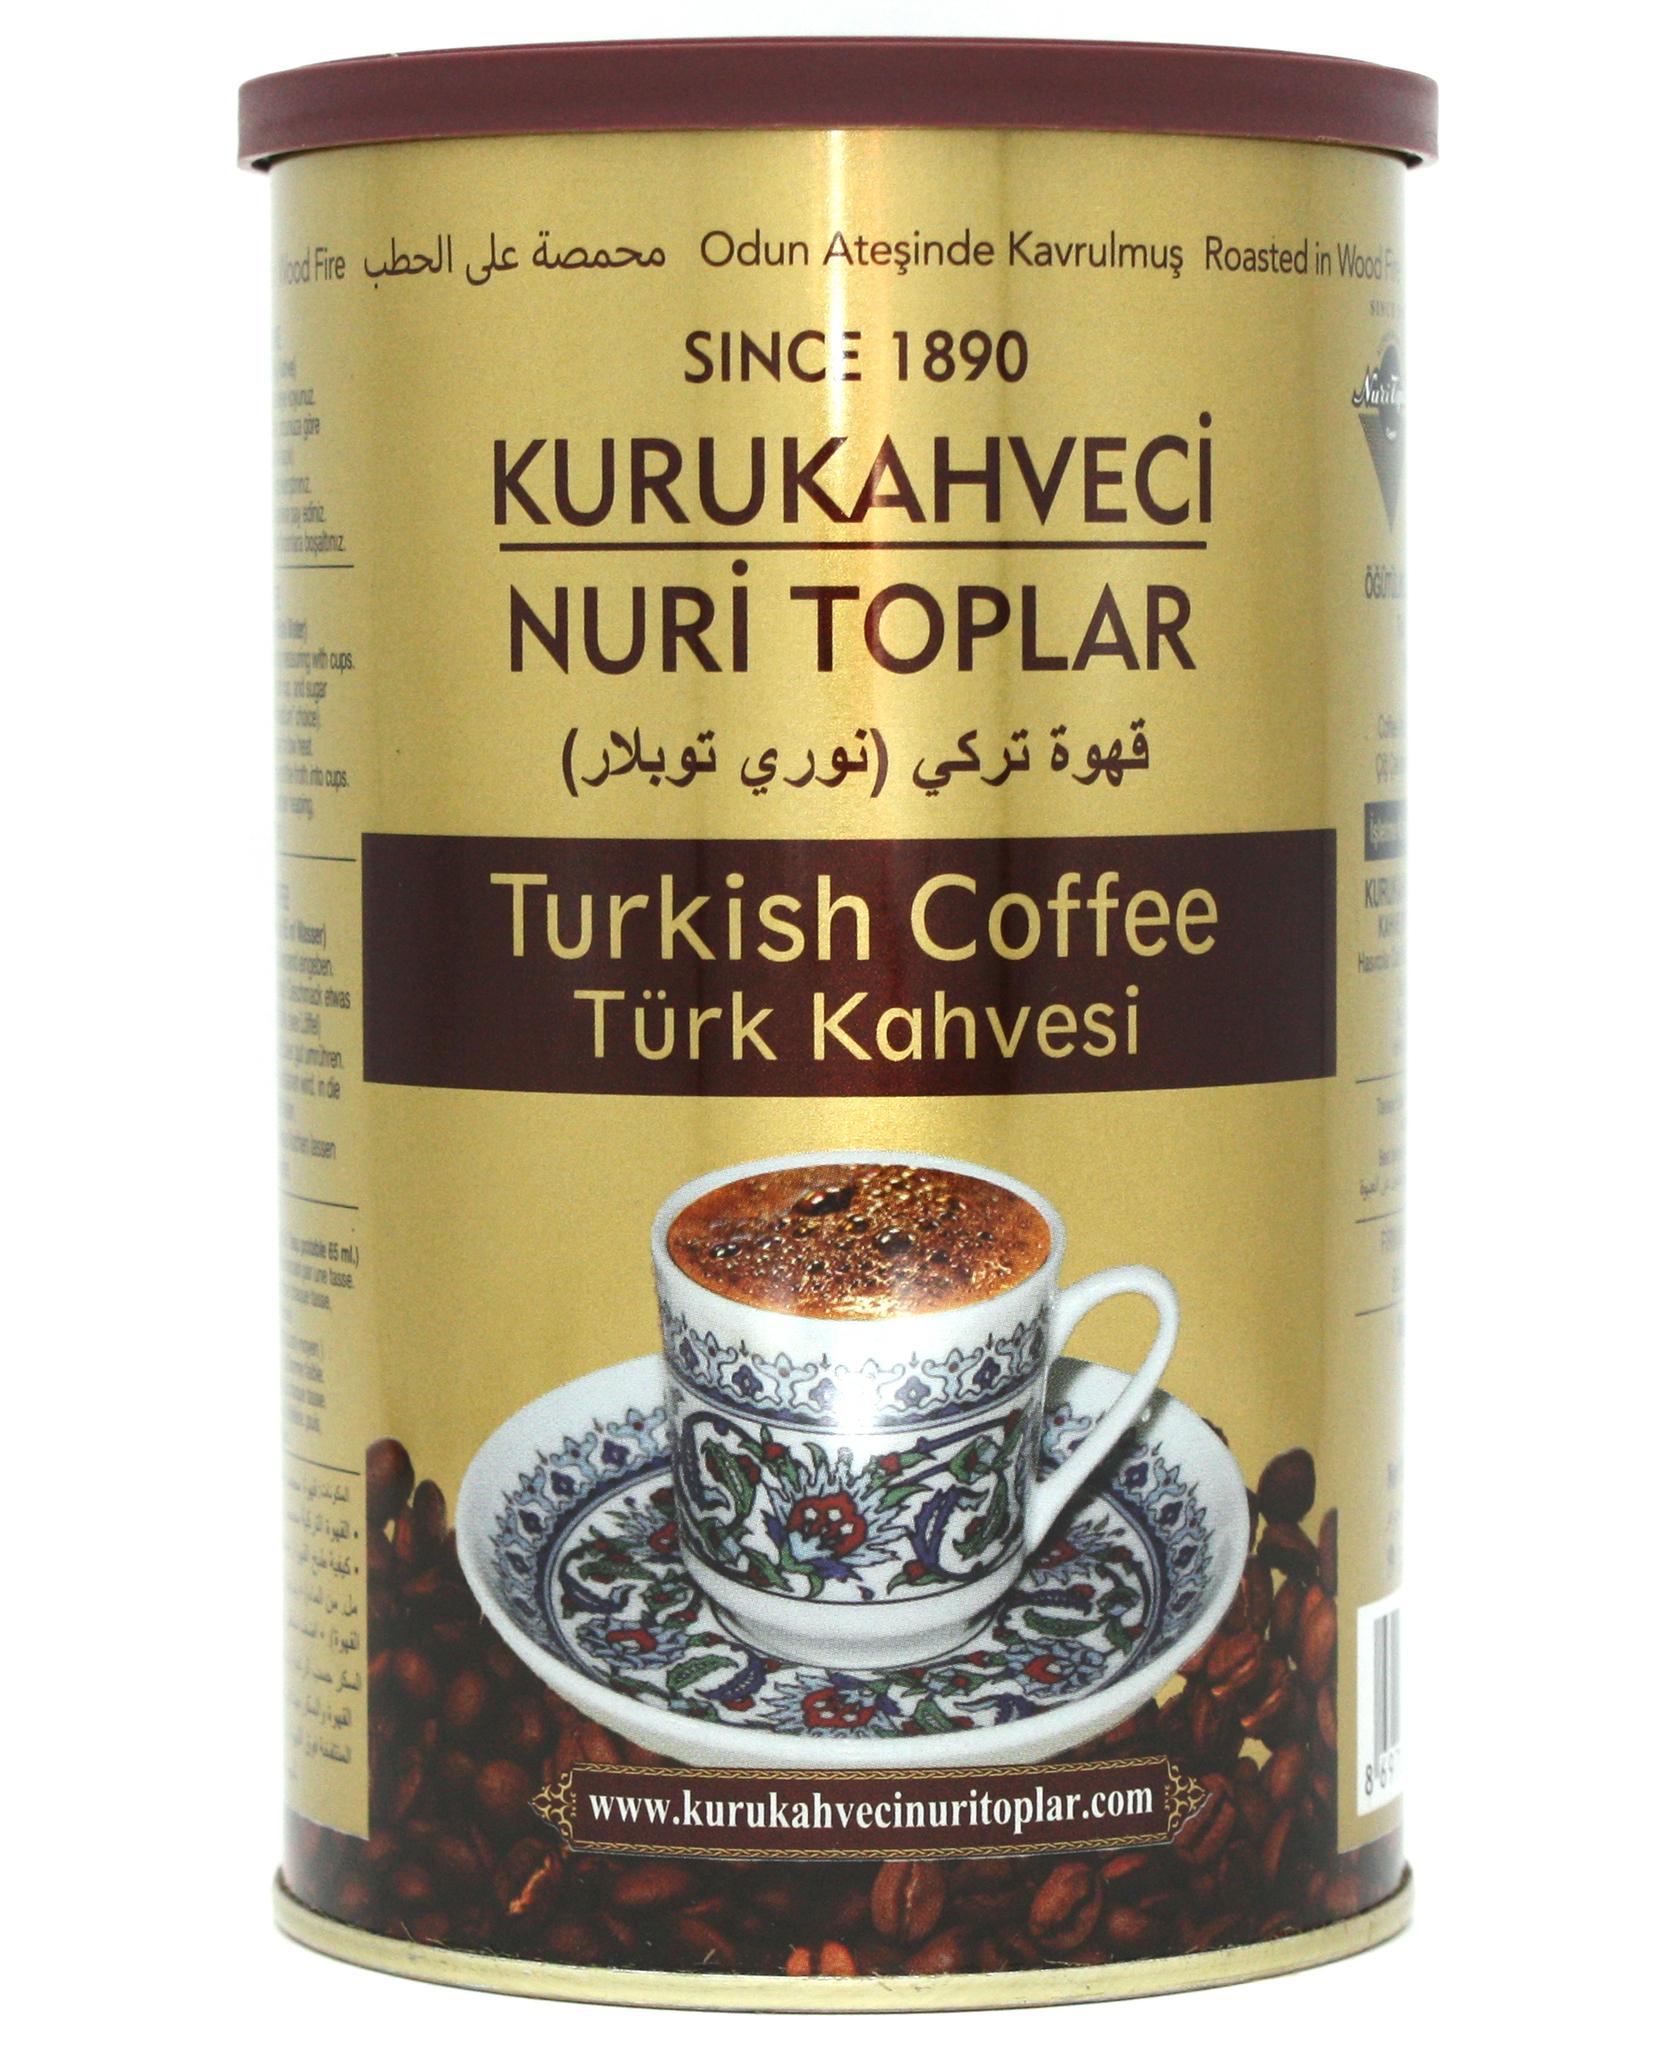 Турецкий кофе Турецкий кофе молотый, Nuri Toplar Turkish, 500 г import_files_48_48a2def8d9e211e9a9b6484d7ecee297_c2b1d525ebee11e9a9b7484d7ecee297.jpg